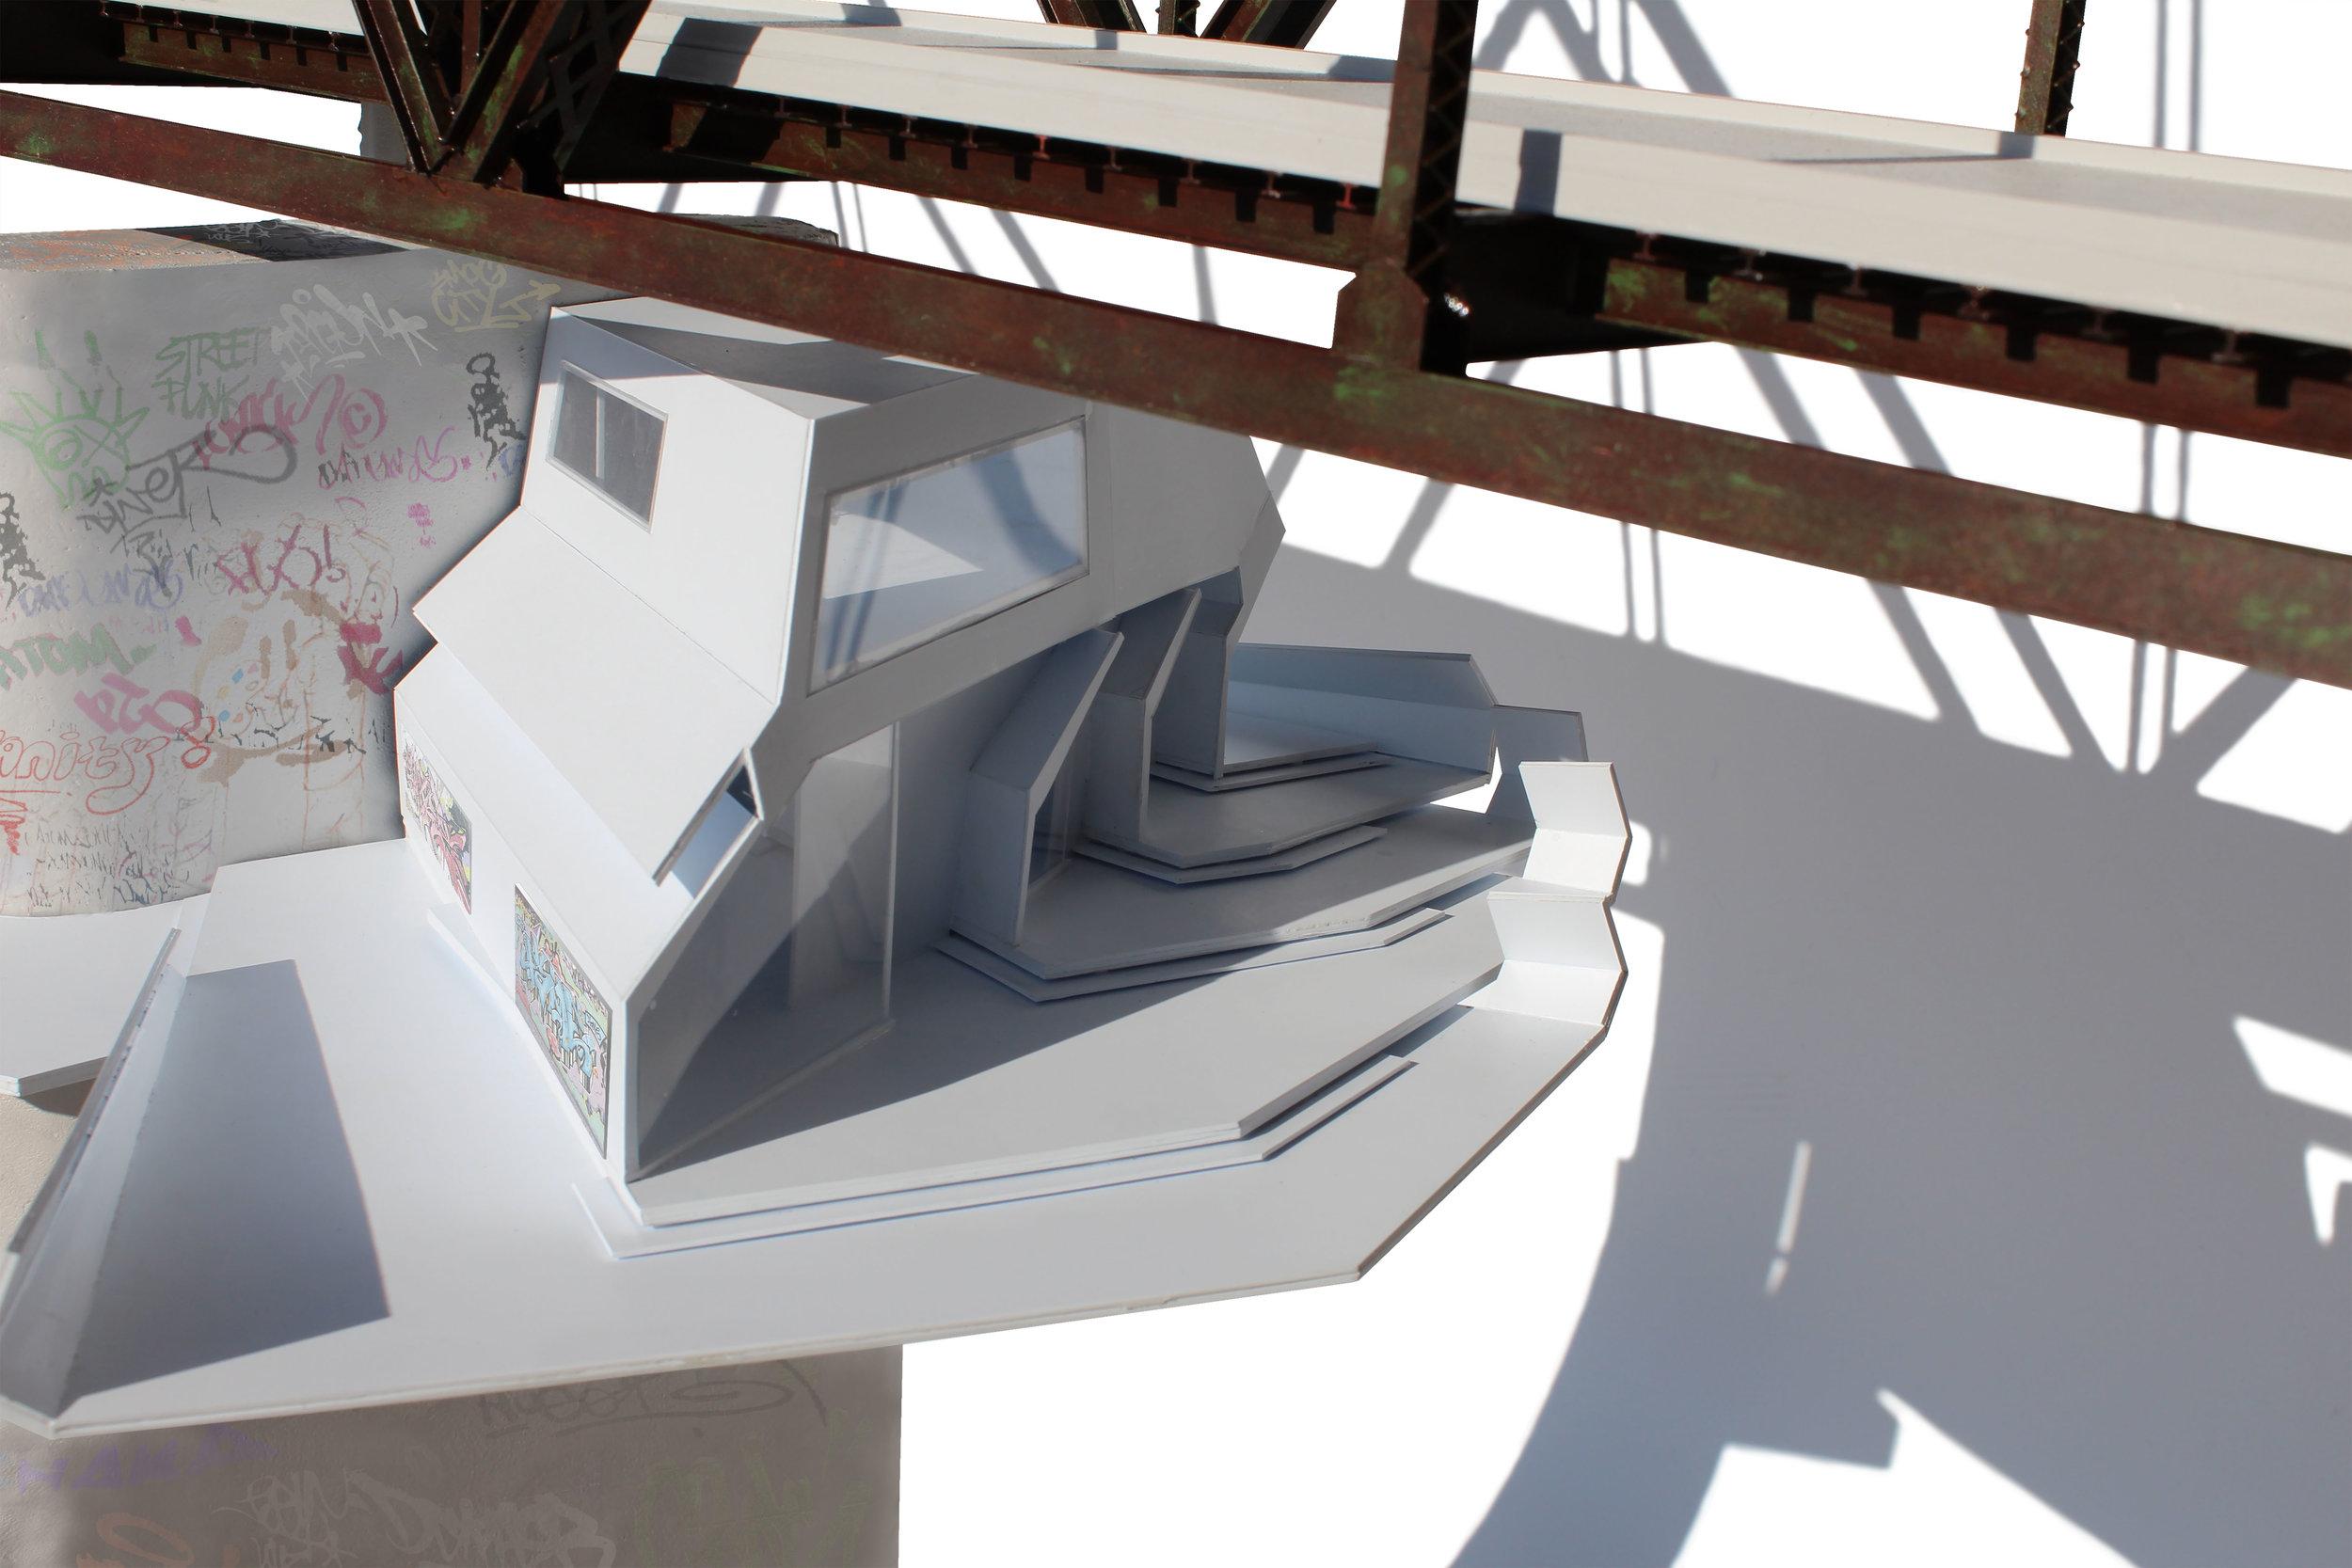 Graffiti House - WashU Adv. Studio I - Observatory - Chain of Rocks Bridge, MOcurating art + residency2015